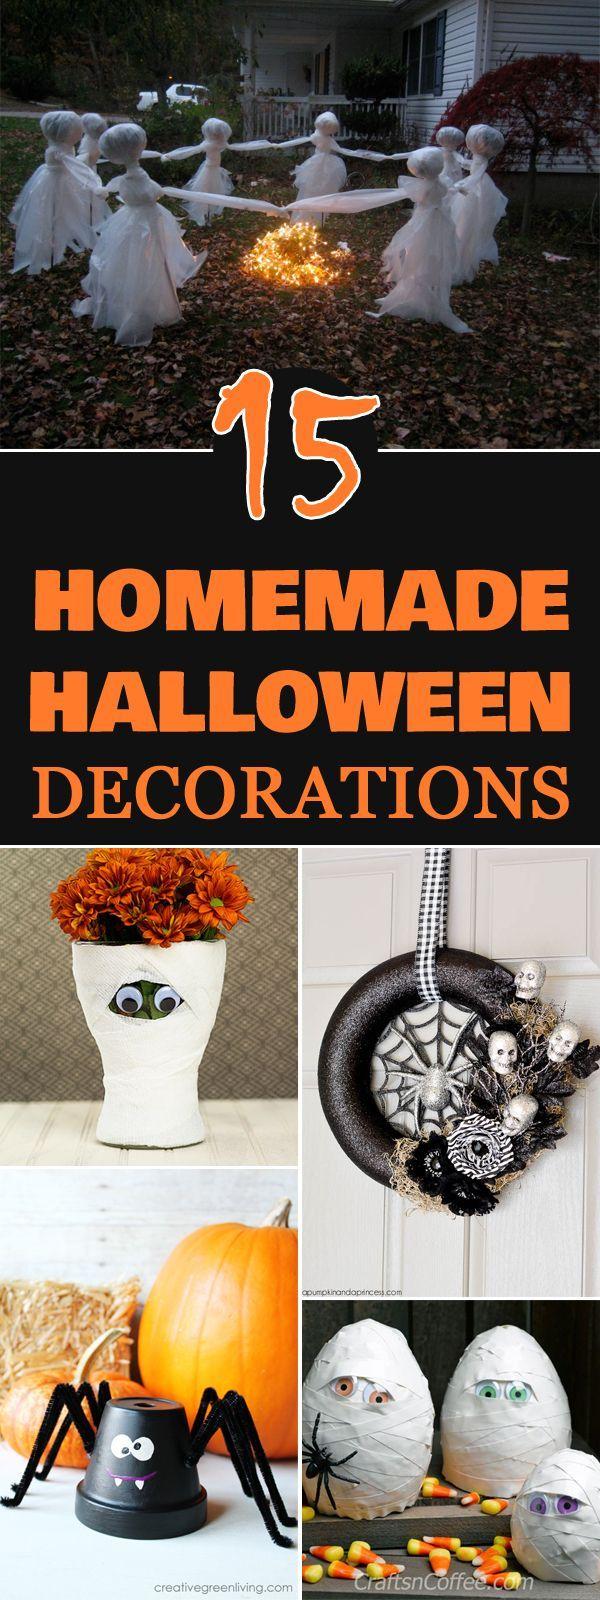 "diytotry "" 15 Easy Homemade Halloween Decorations"